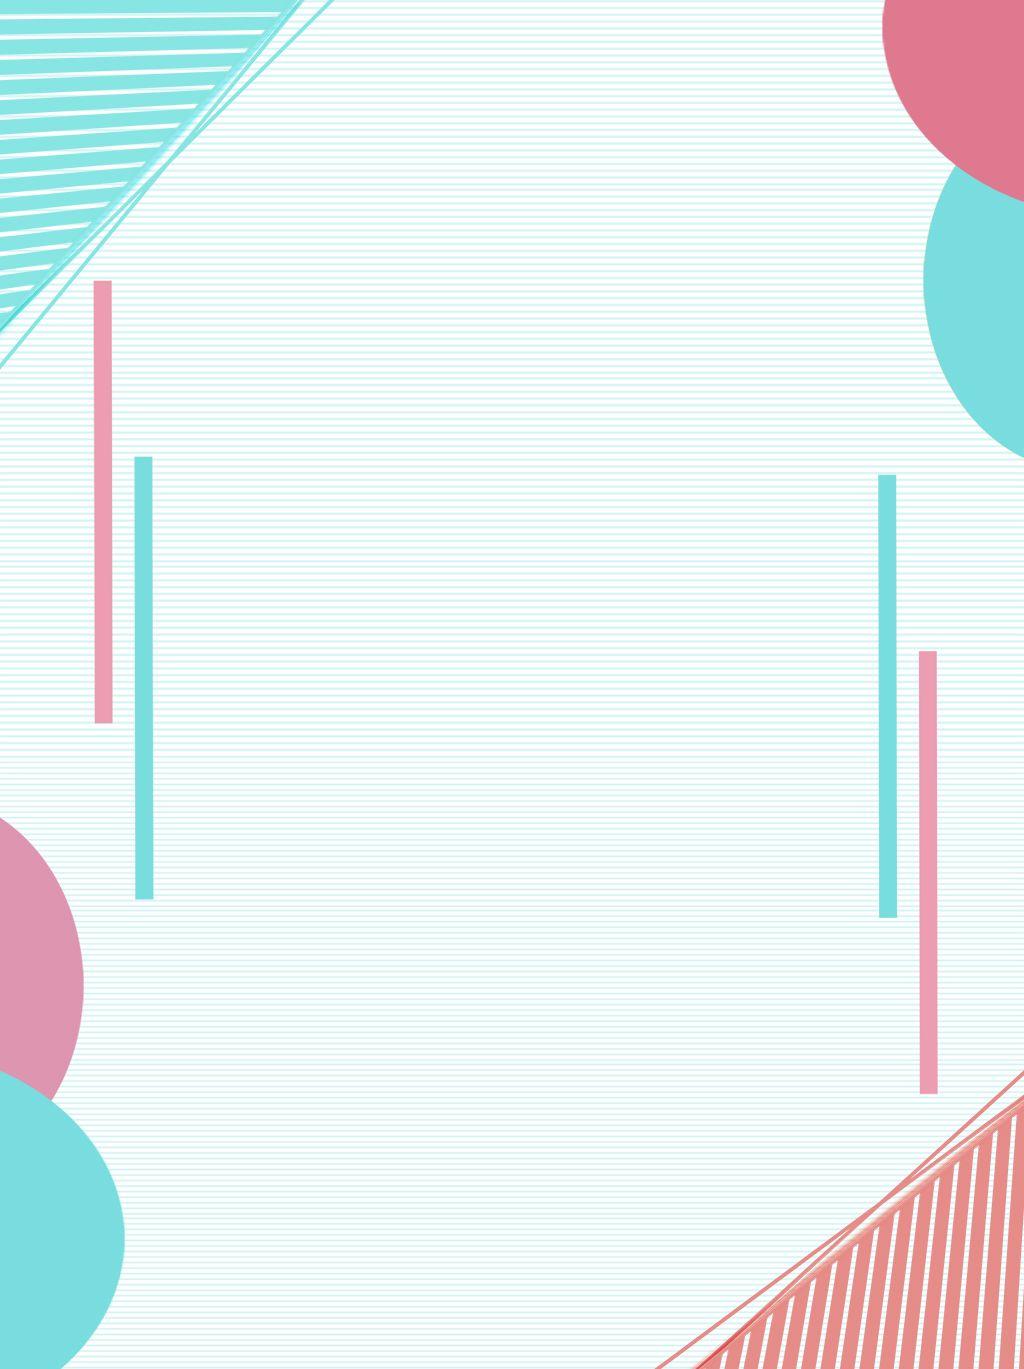 Simple Line Universal Background Simple Background Design Background Design Powerpoint Background Design